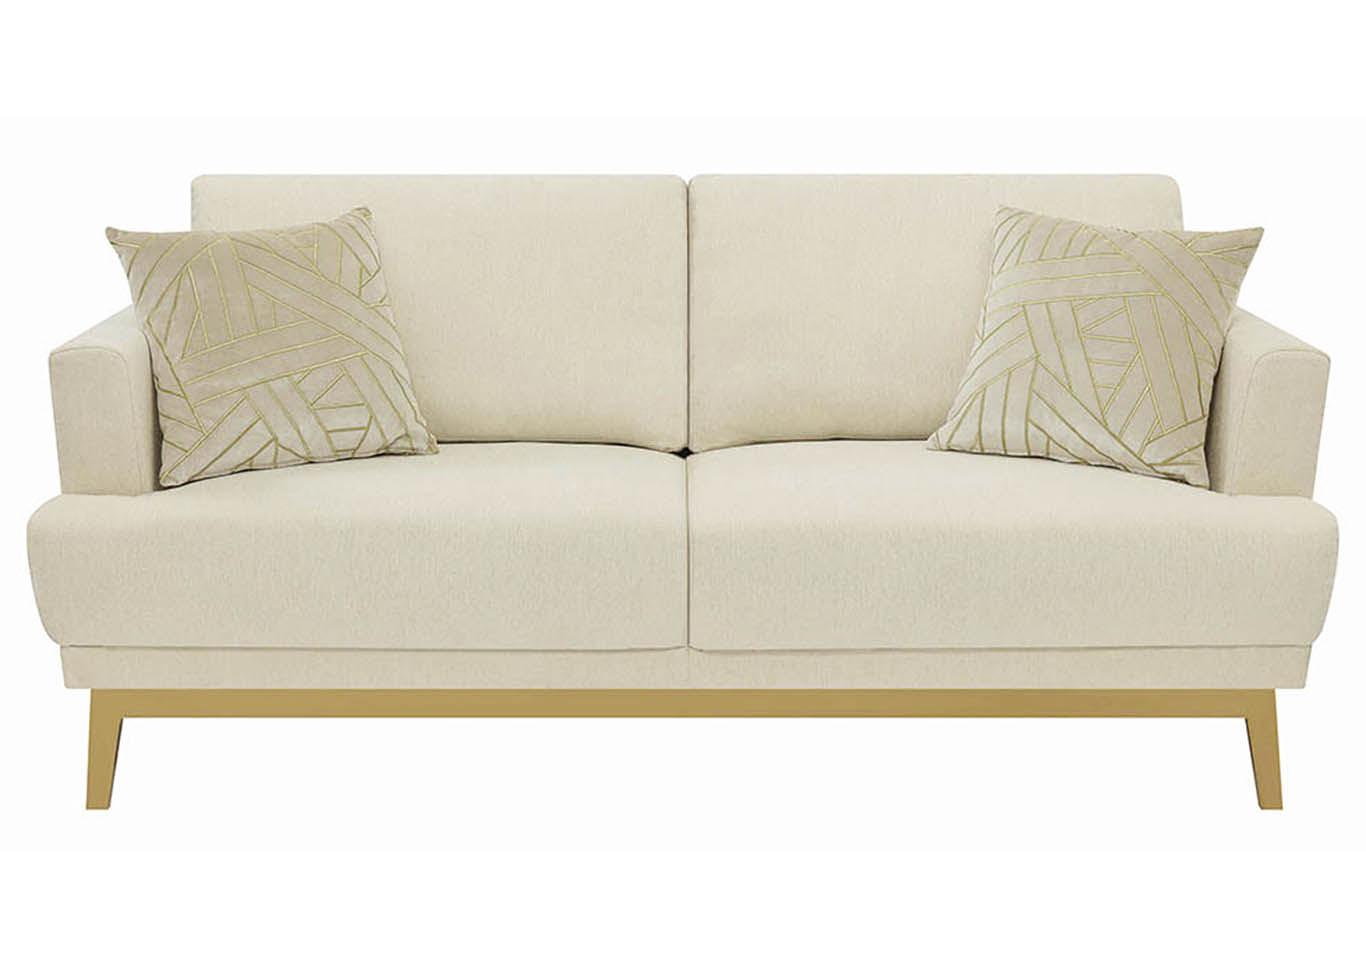 Groovy Amite City Furniture Amite La Margot Beige Sofa Lamtechconsult Wood Chair Design Ideas Lamtechconsultcom